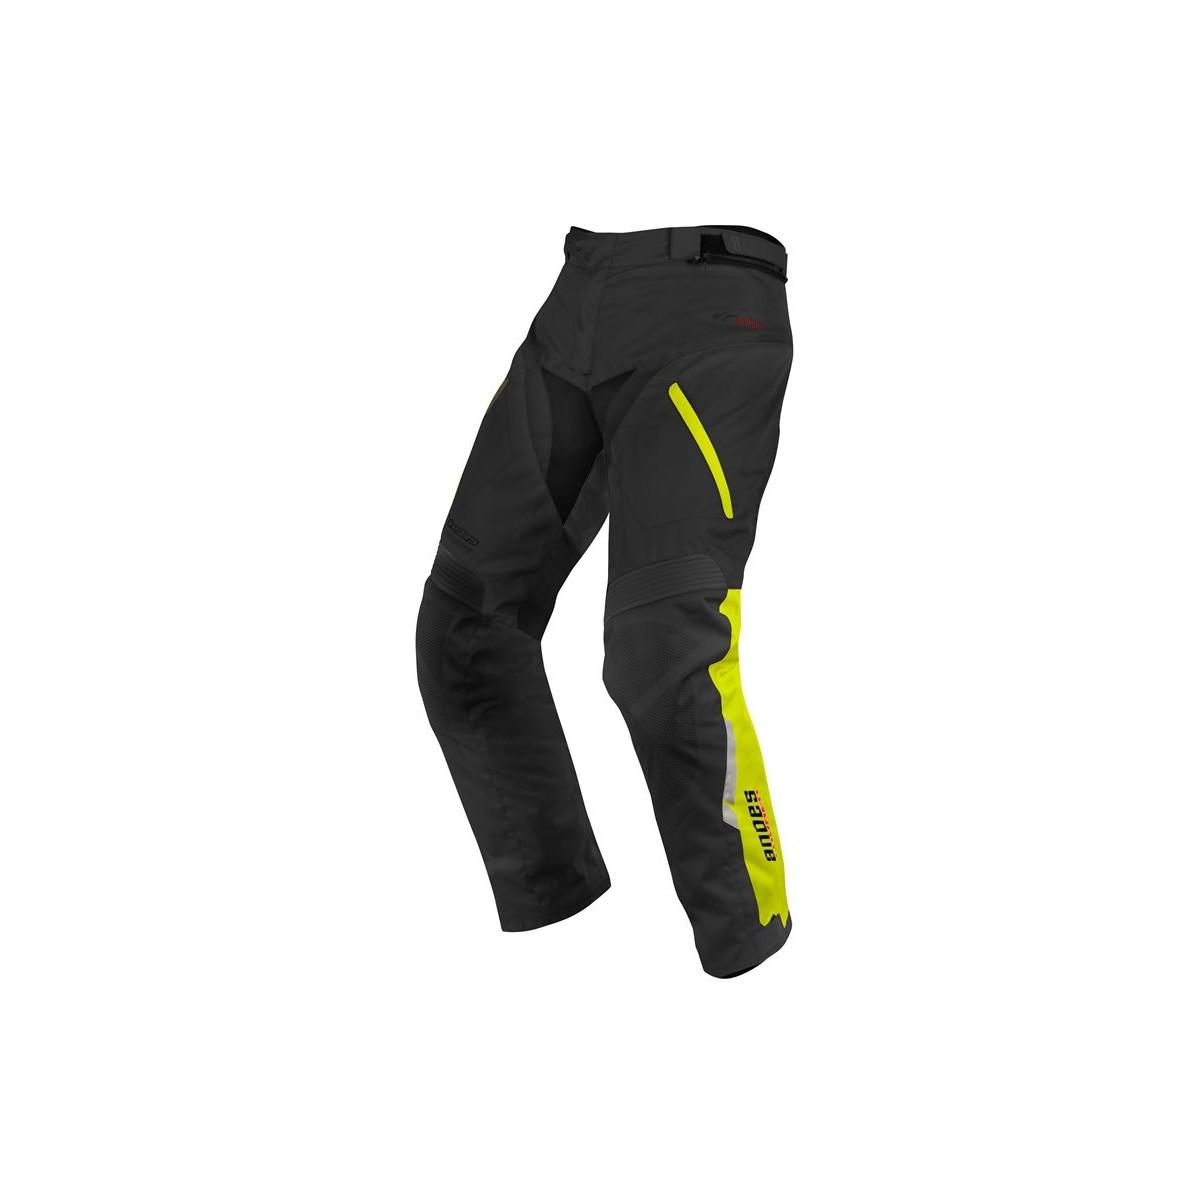 Pantalon Alpinestars Andes Drystar Negro Amarillo Fluor Compra Online